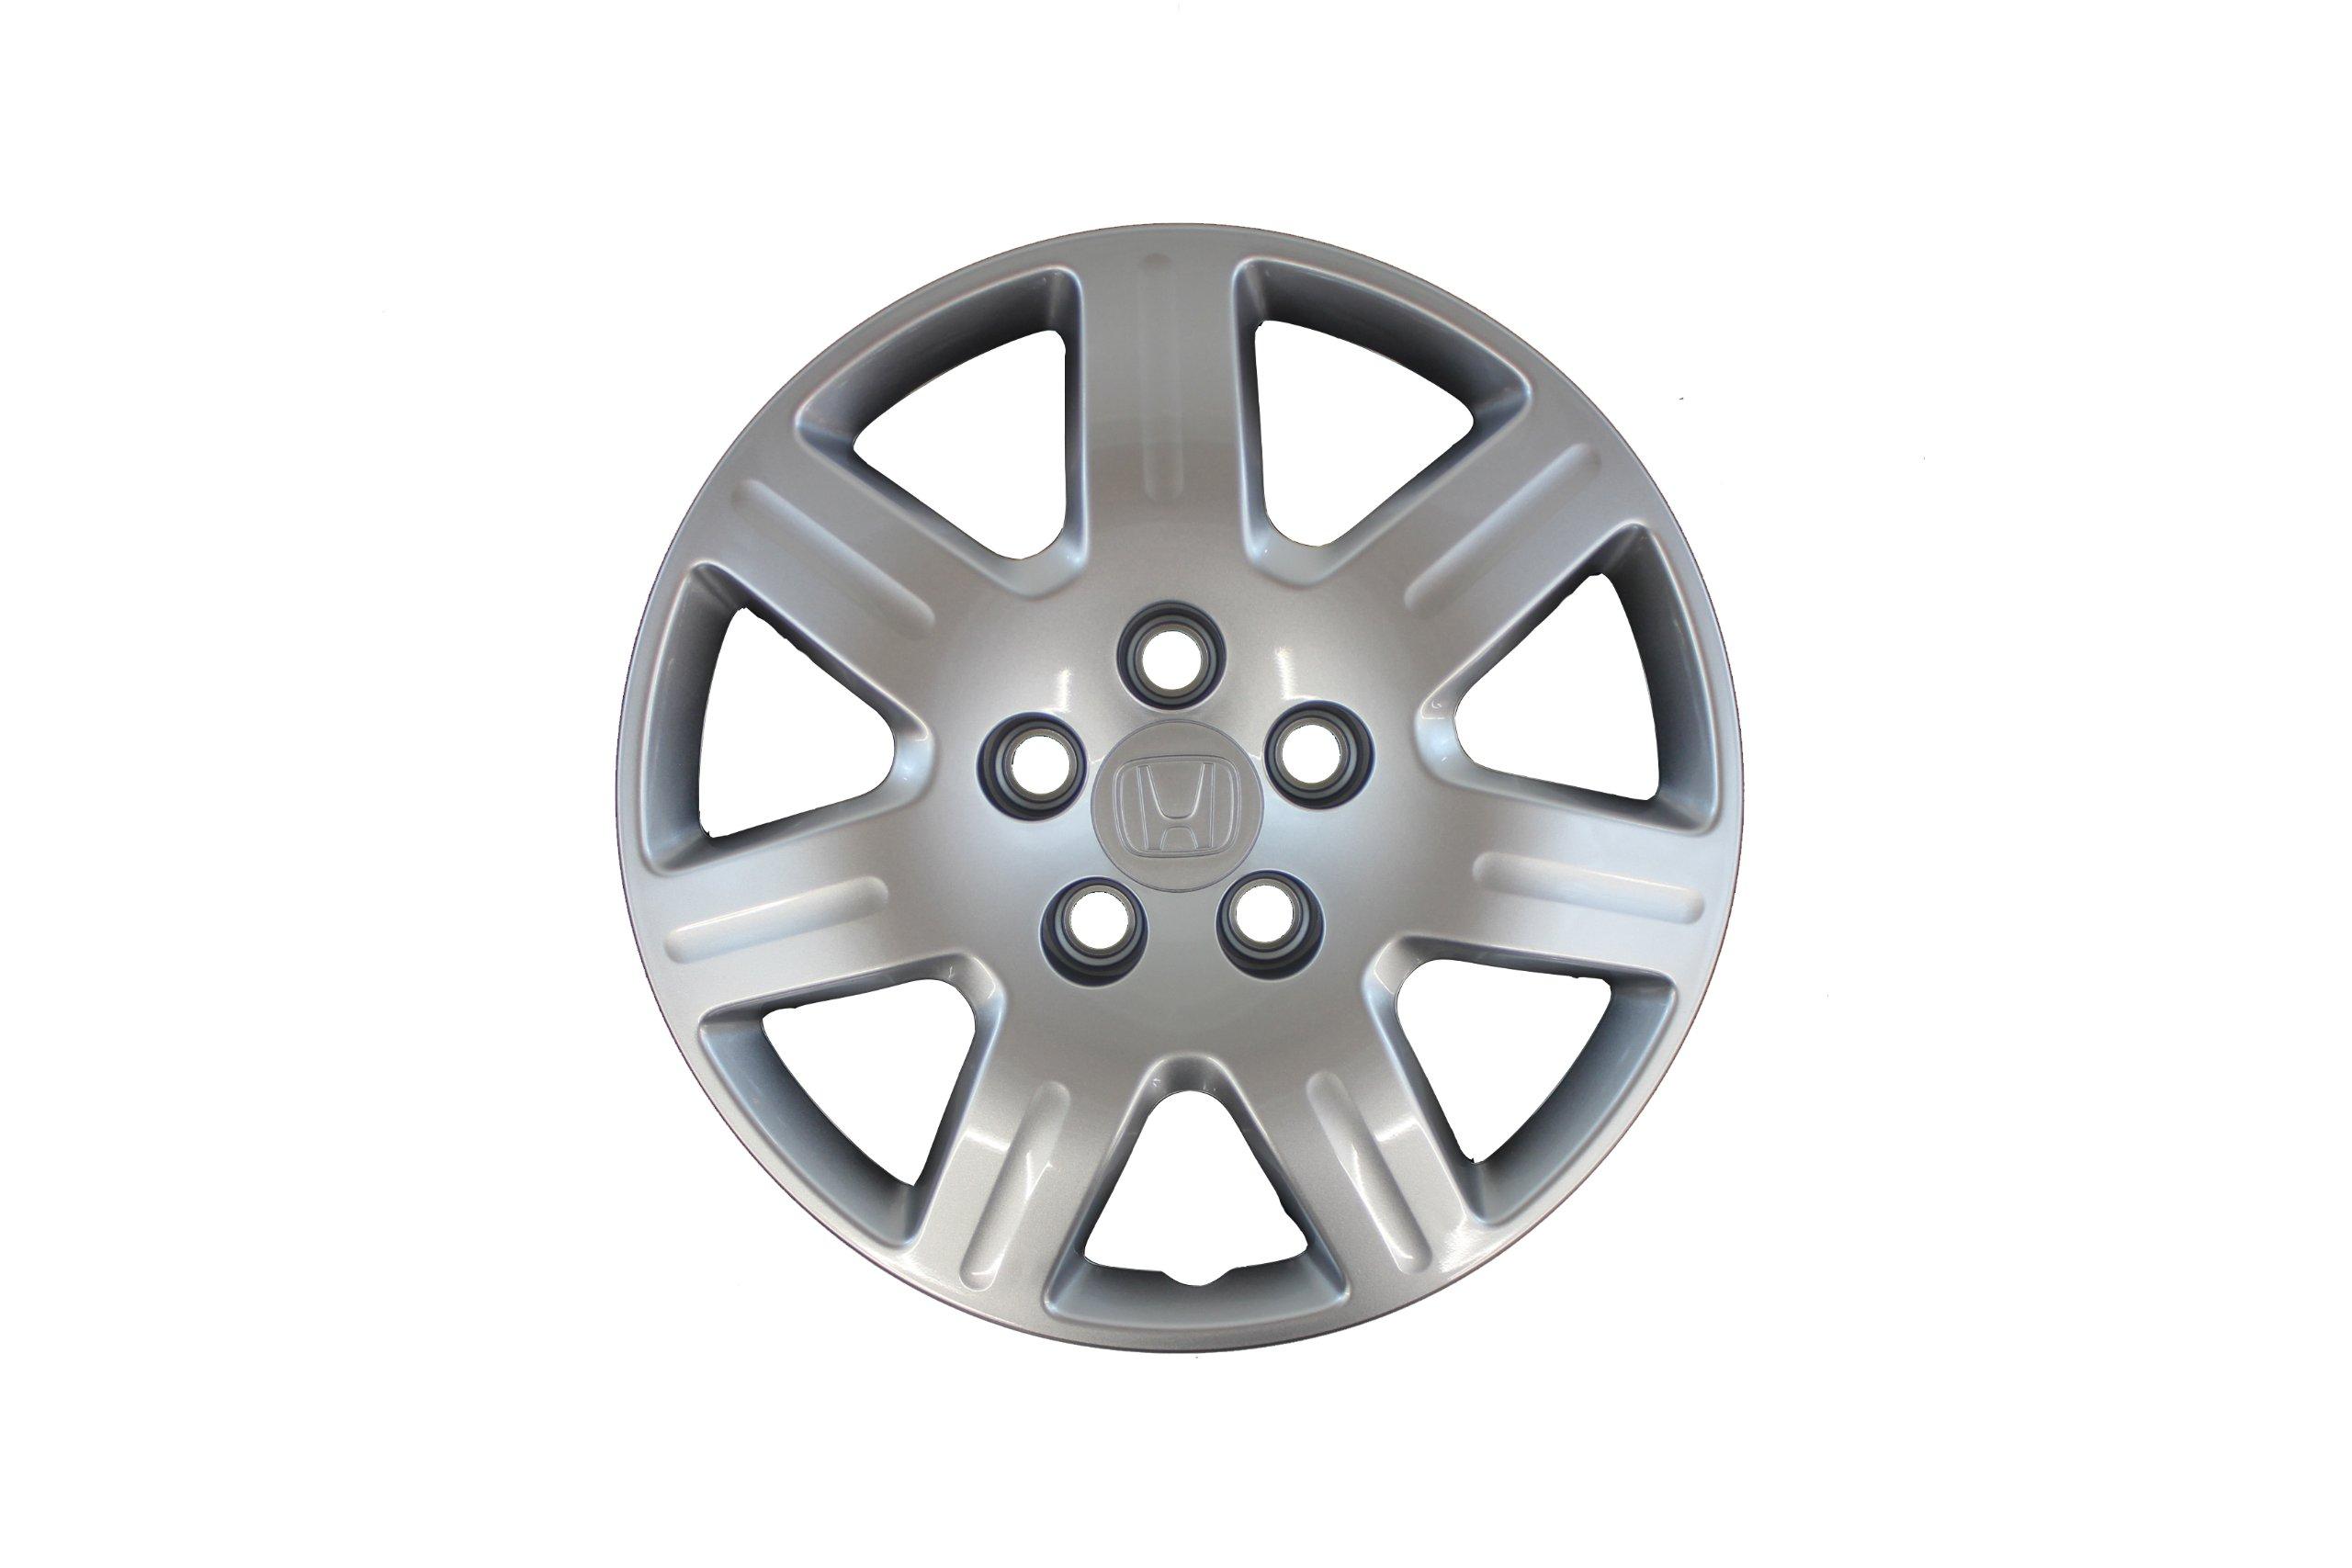 Honda Genuine Parts 44733-SNE-A10 Wheel Hubcap (Pack of 1)